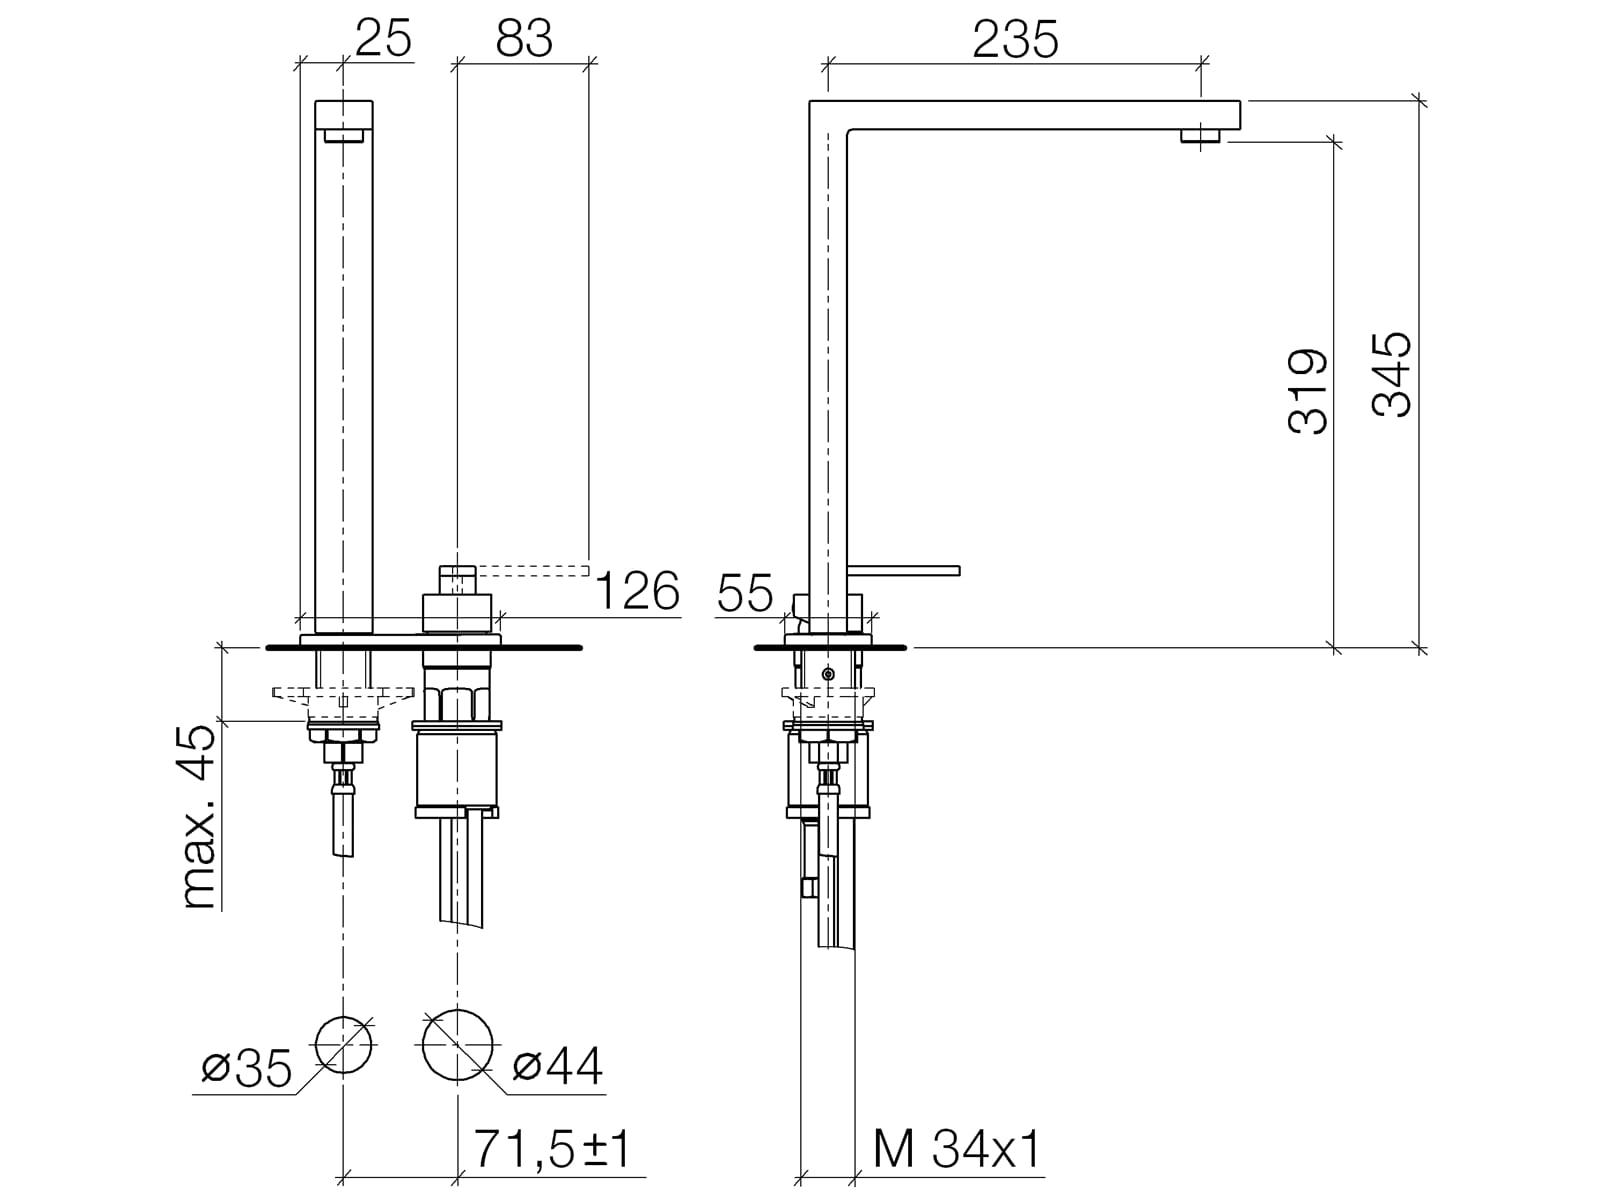 Dornbracht Lot Zweilochbatterie Platin Matt 32 843 680-06 Hochdruckarmatur